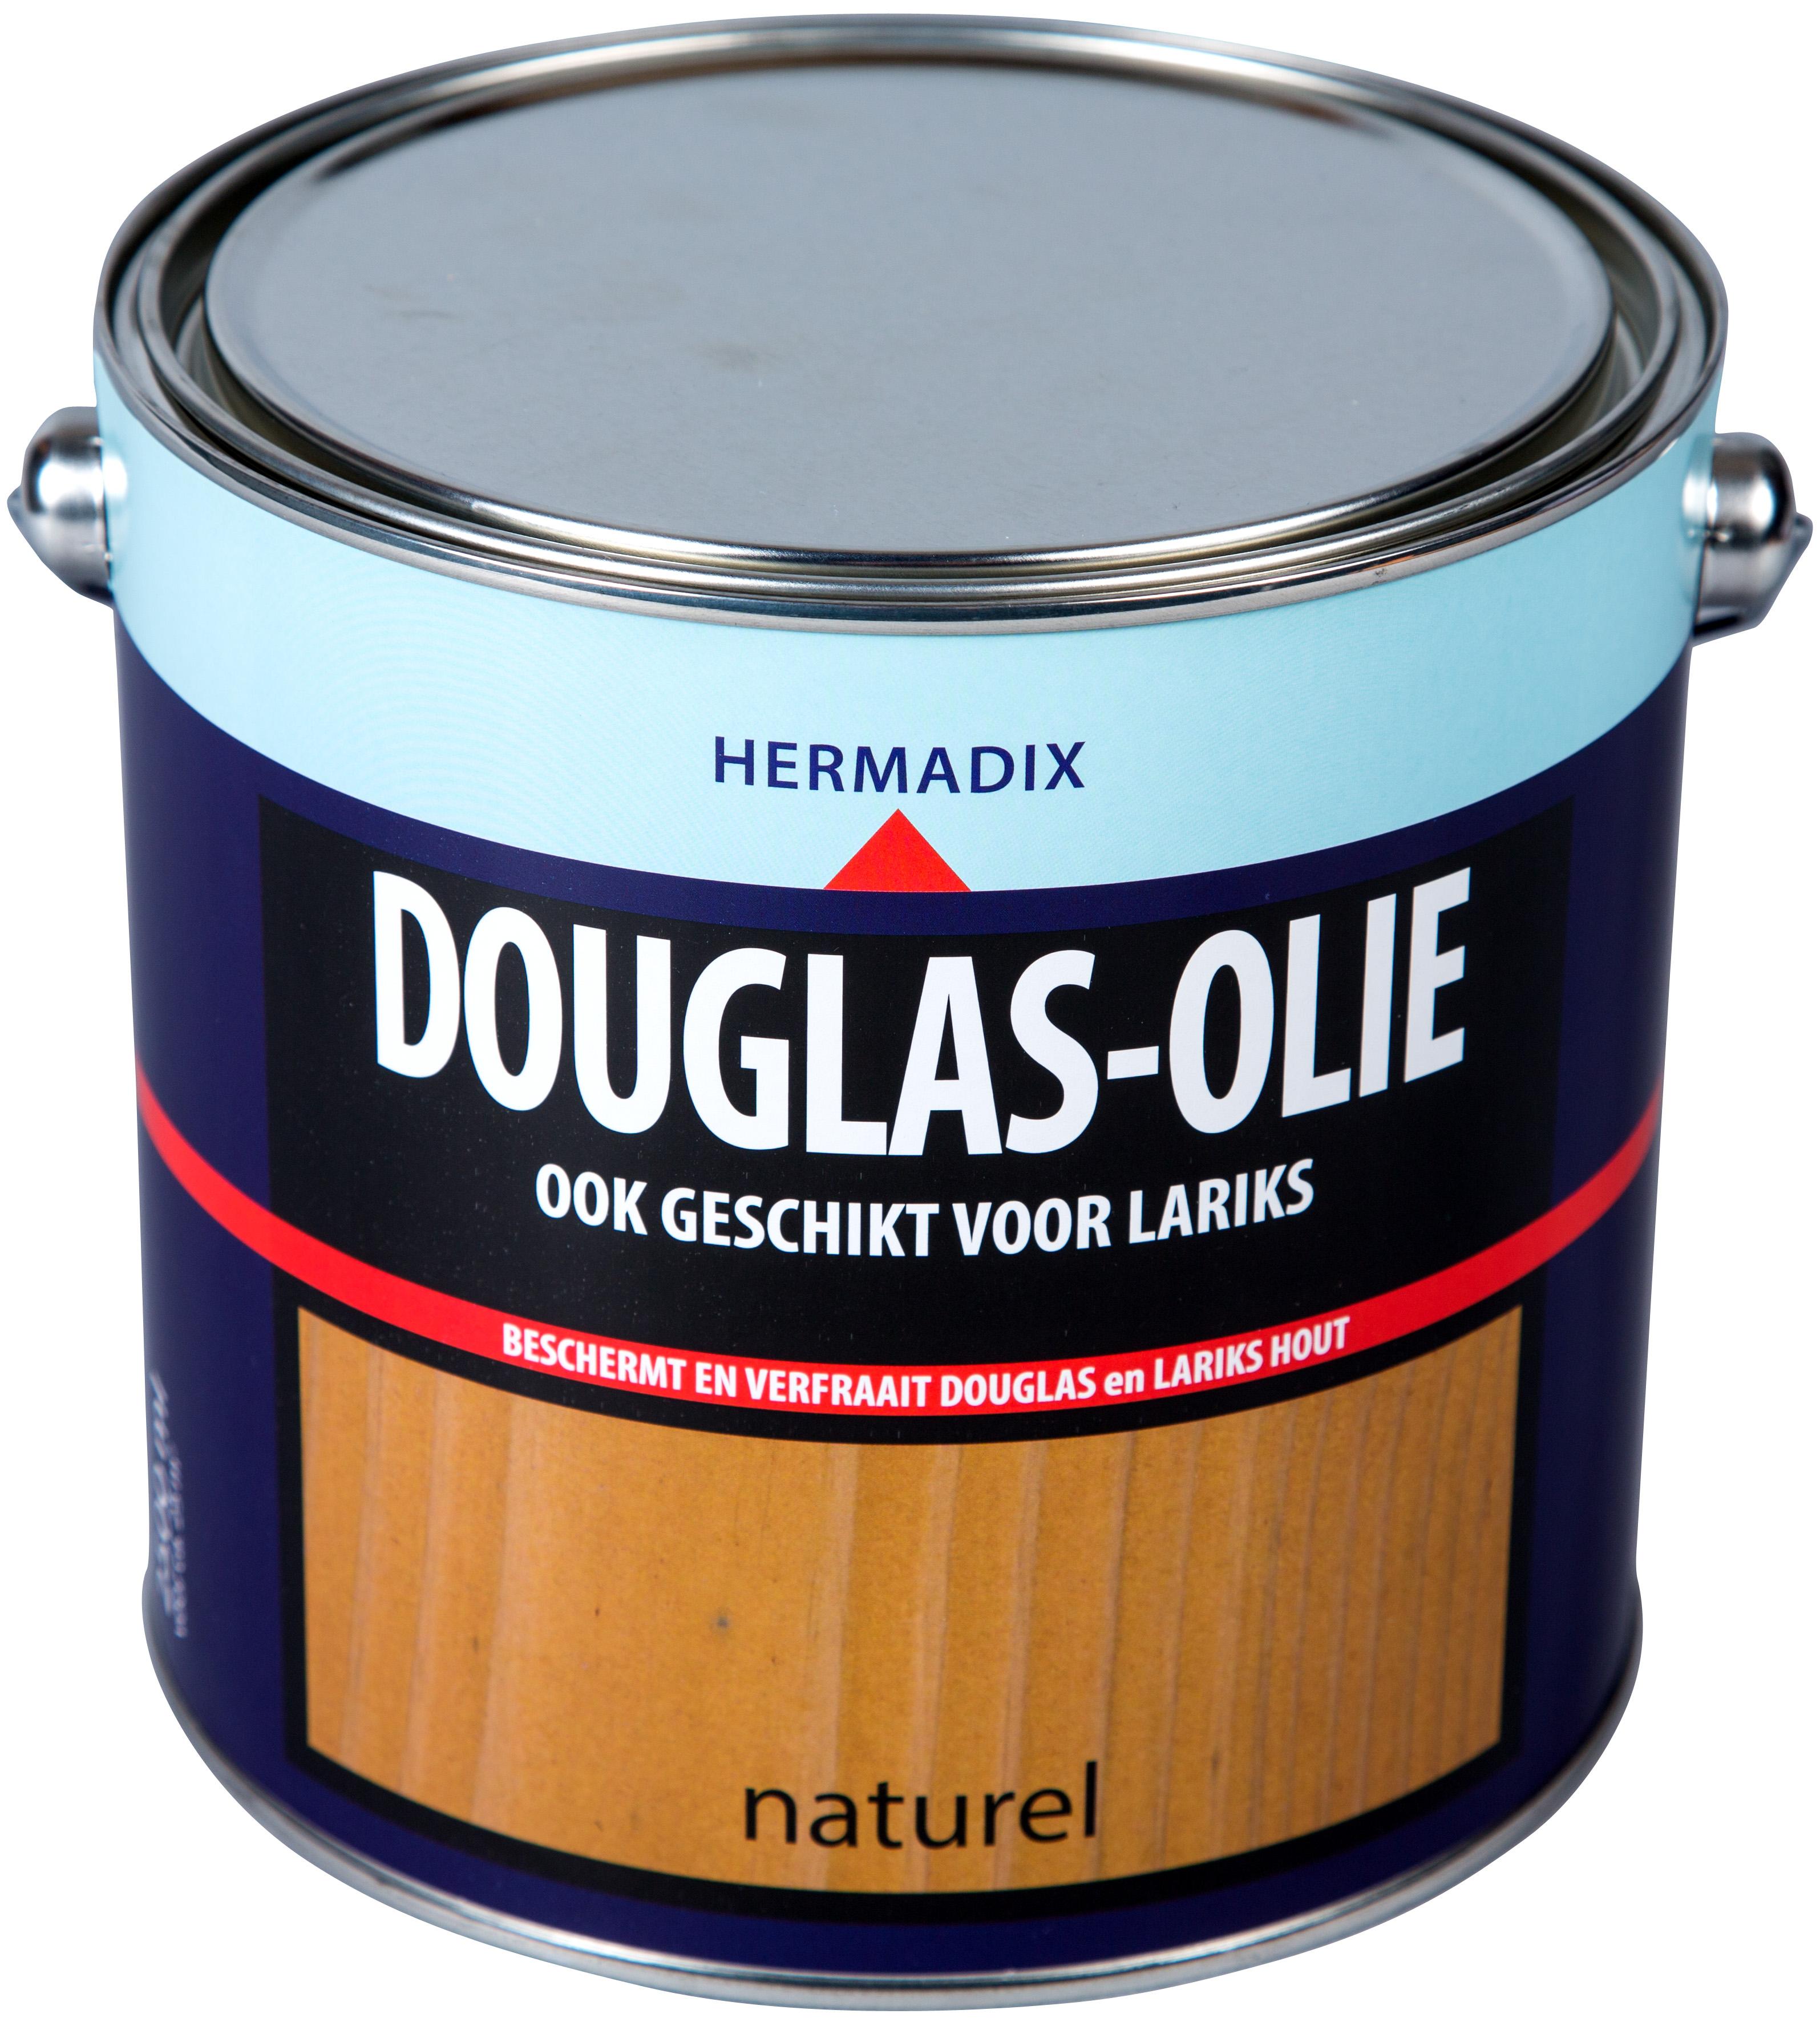 Hermadix Douglas Olie Naturel 2500 ml